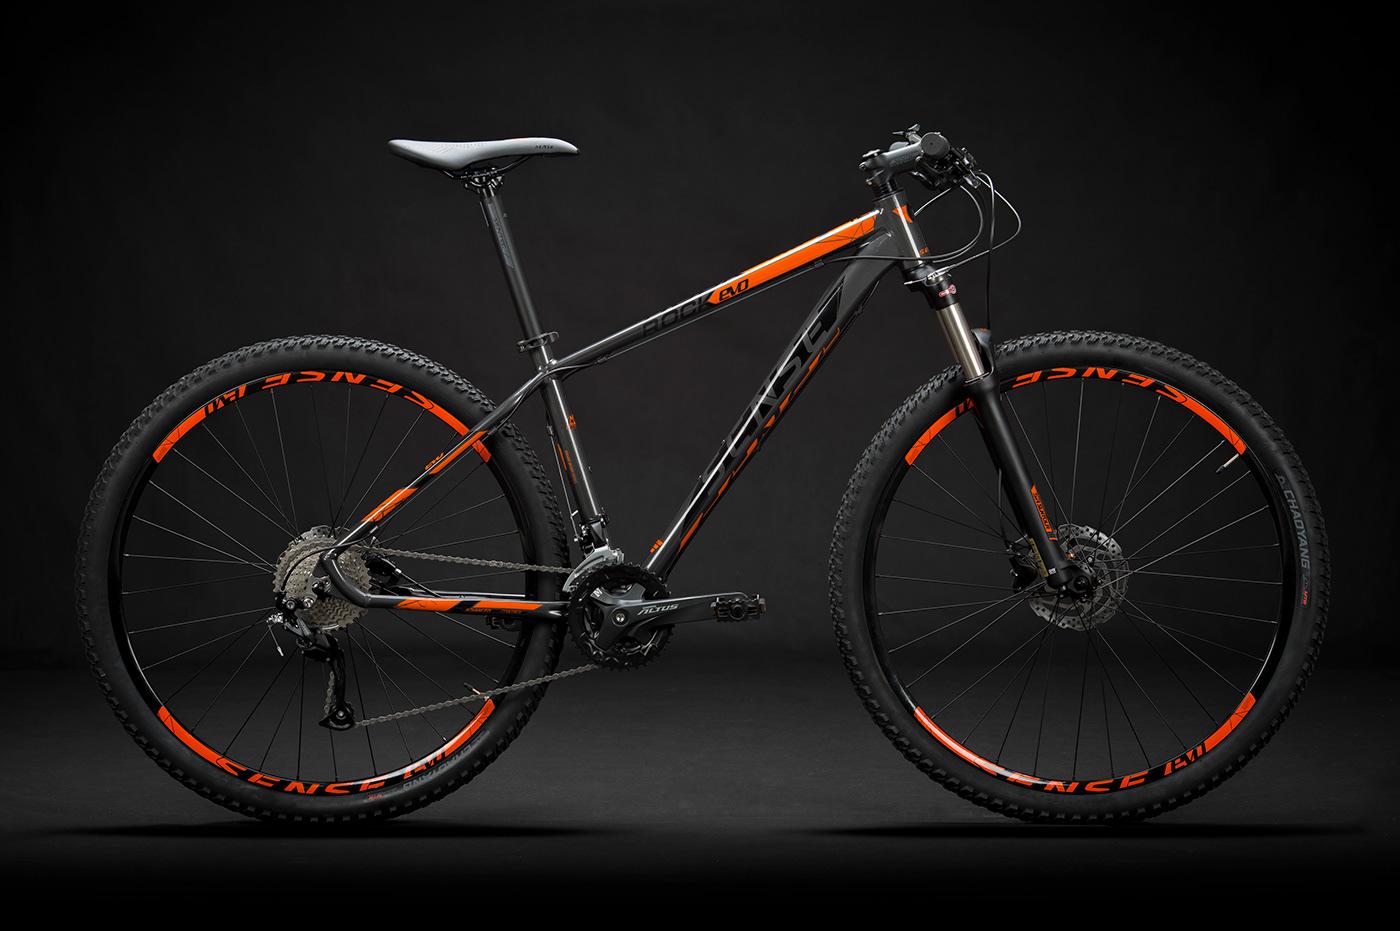 Gabriel Delfino Delfino Design Alloy bikes aluminun ALUMINUN BIKES transportation bikes bicicleta design identidade visual